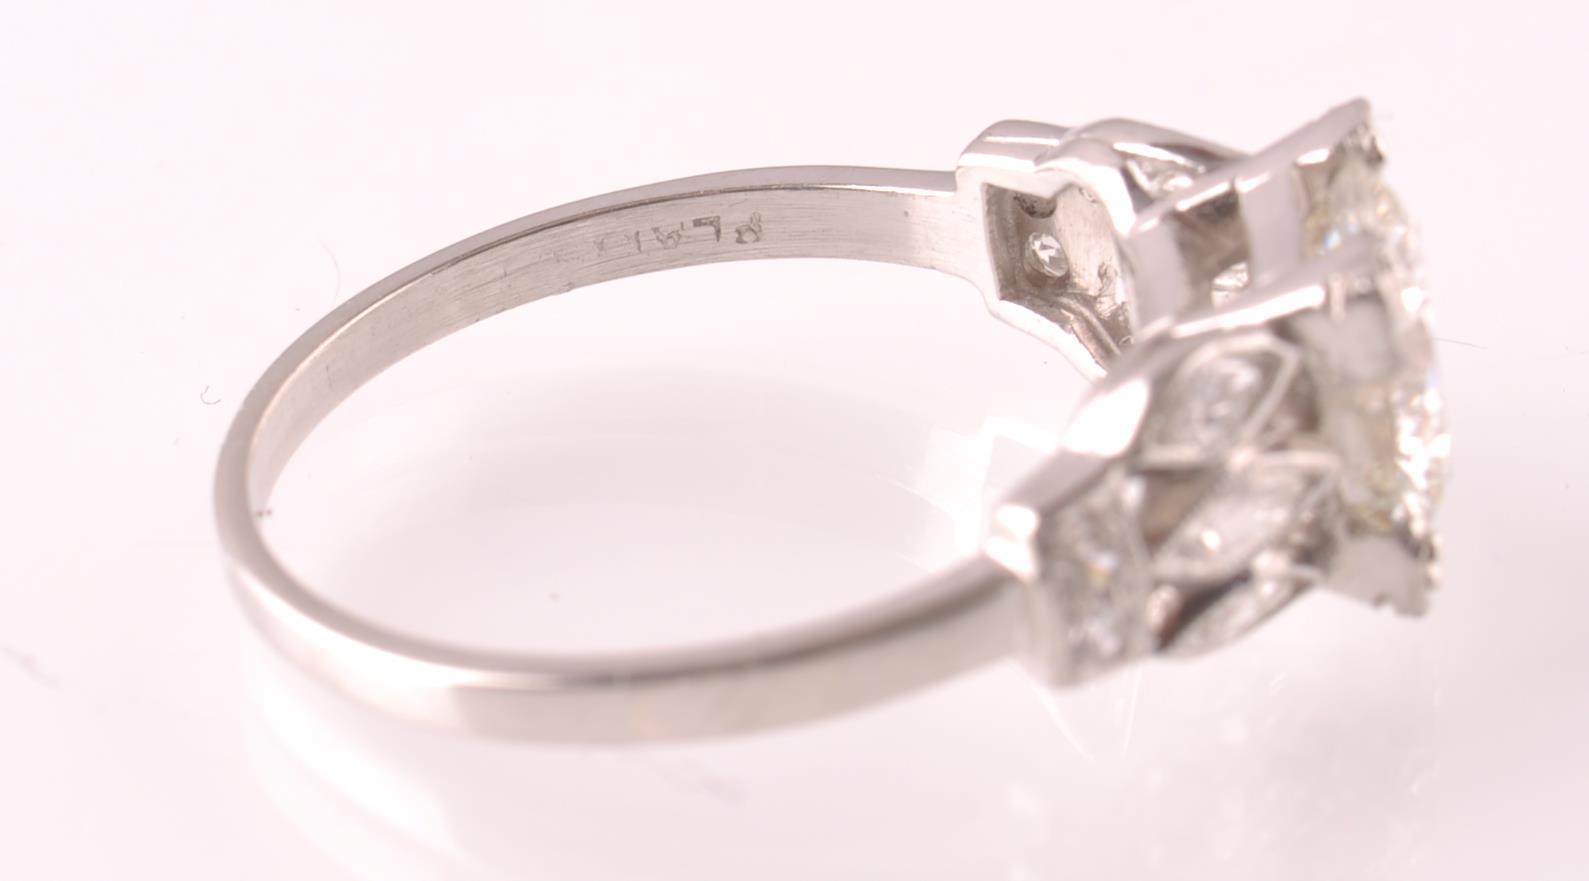 ART DECO PLATINUM AND DIAMOND SOLITAIRE 2CT RING - Image 5 of 5